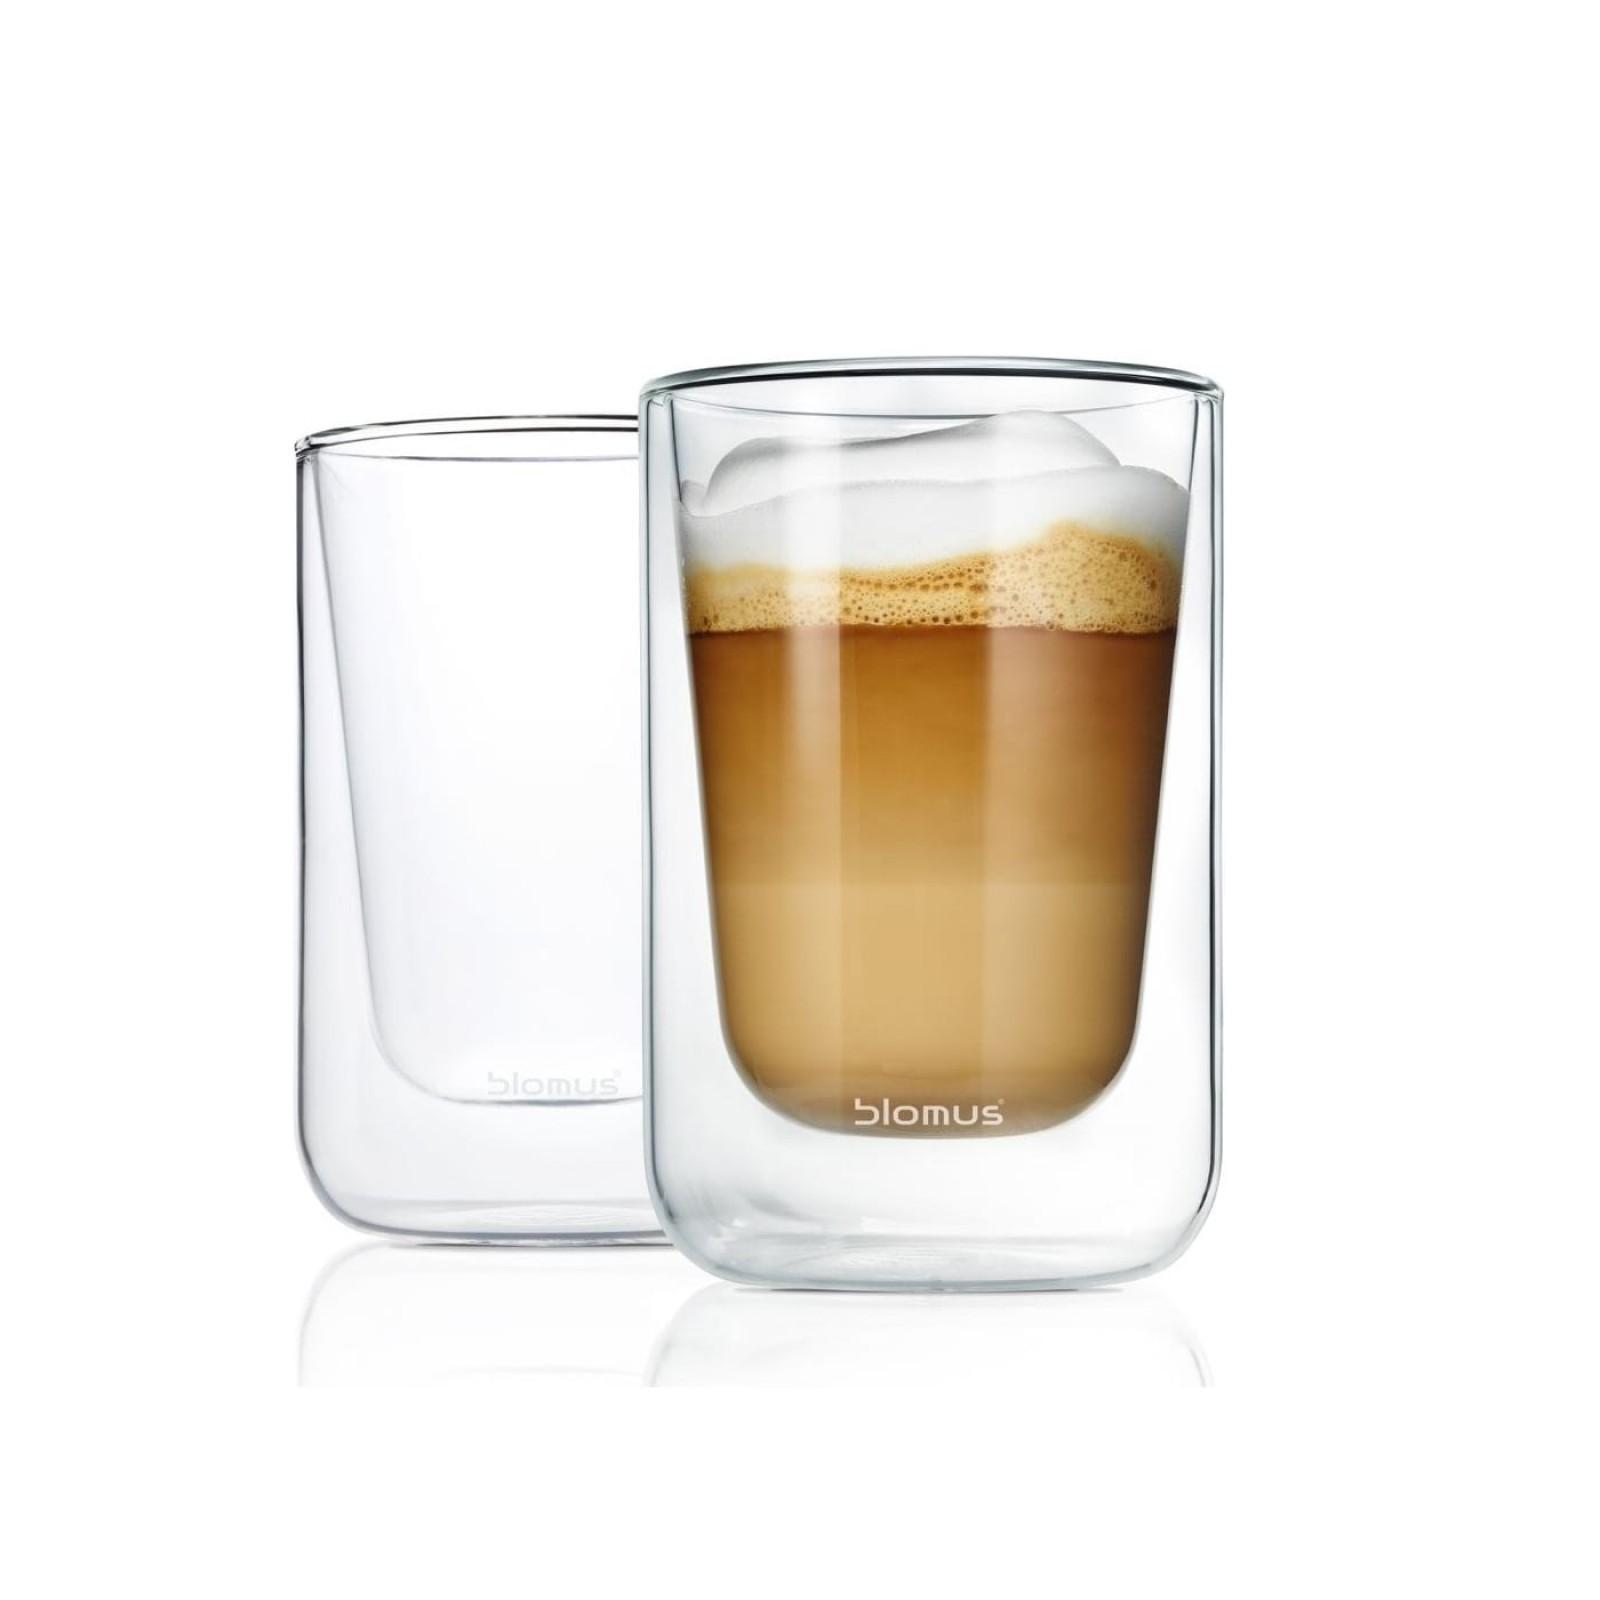 NERO Insulated Cappuccino Glasses 250ml (Set of 2) - Blomus